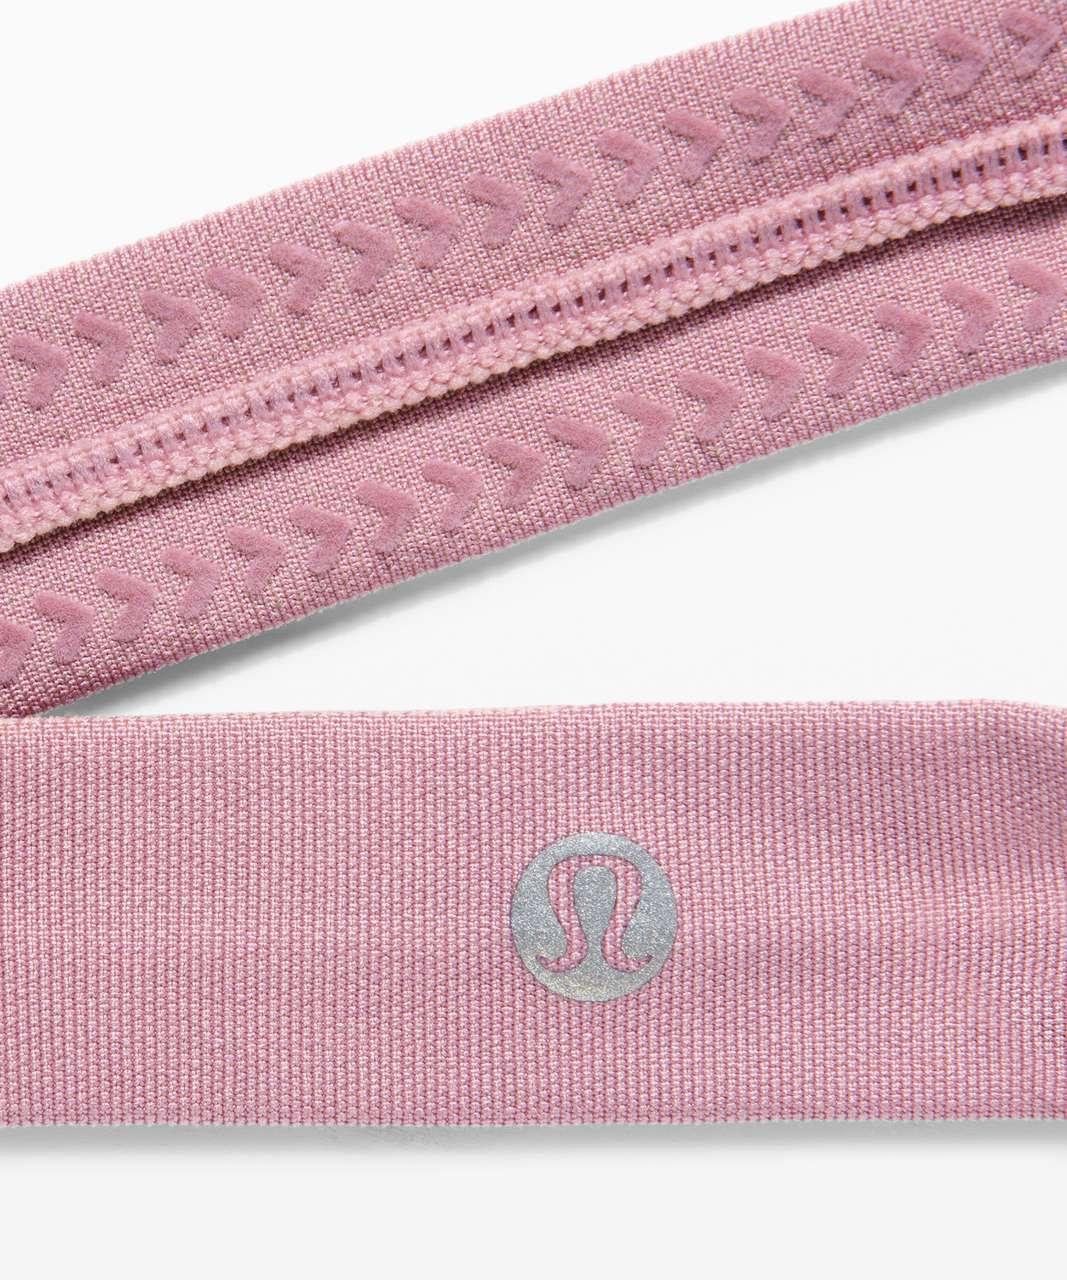 Lululemon Cardio Cross Trainer Headband - Pink Taupe / Ballet Slipper